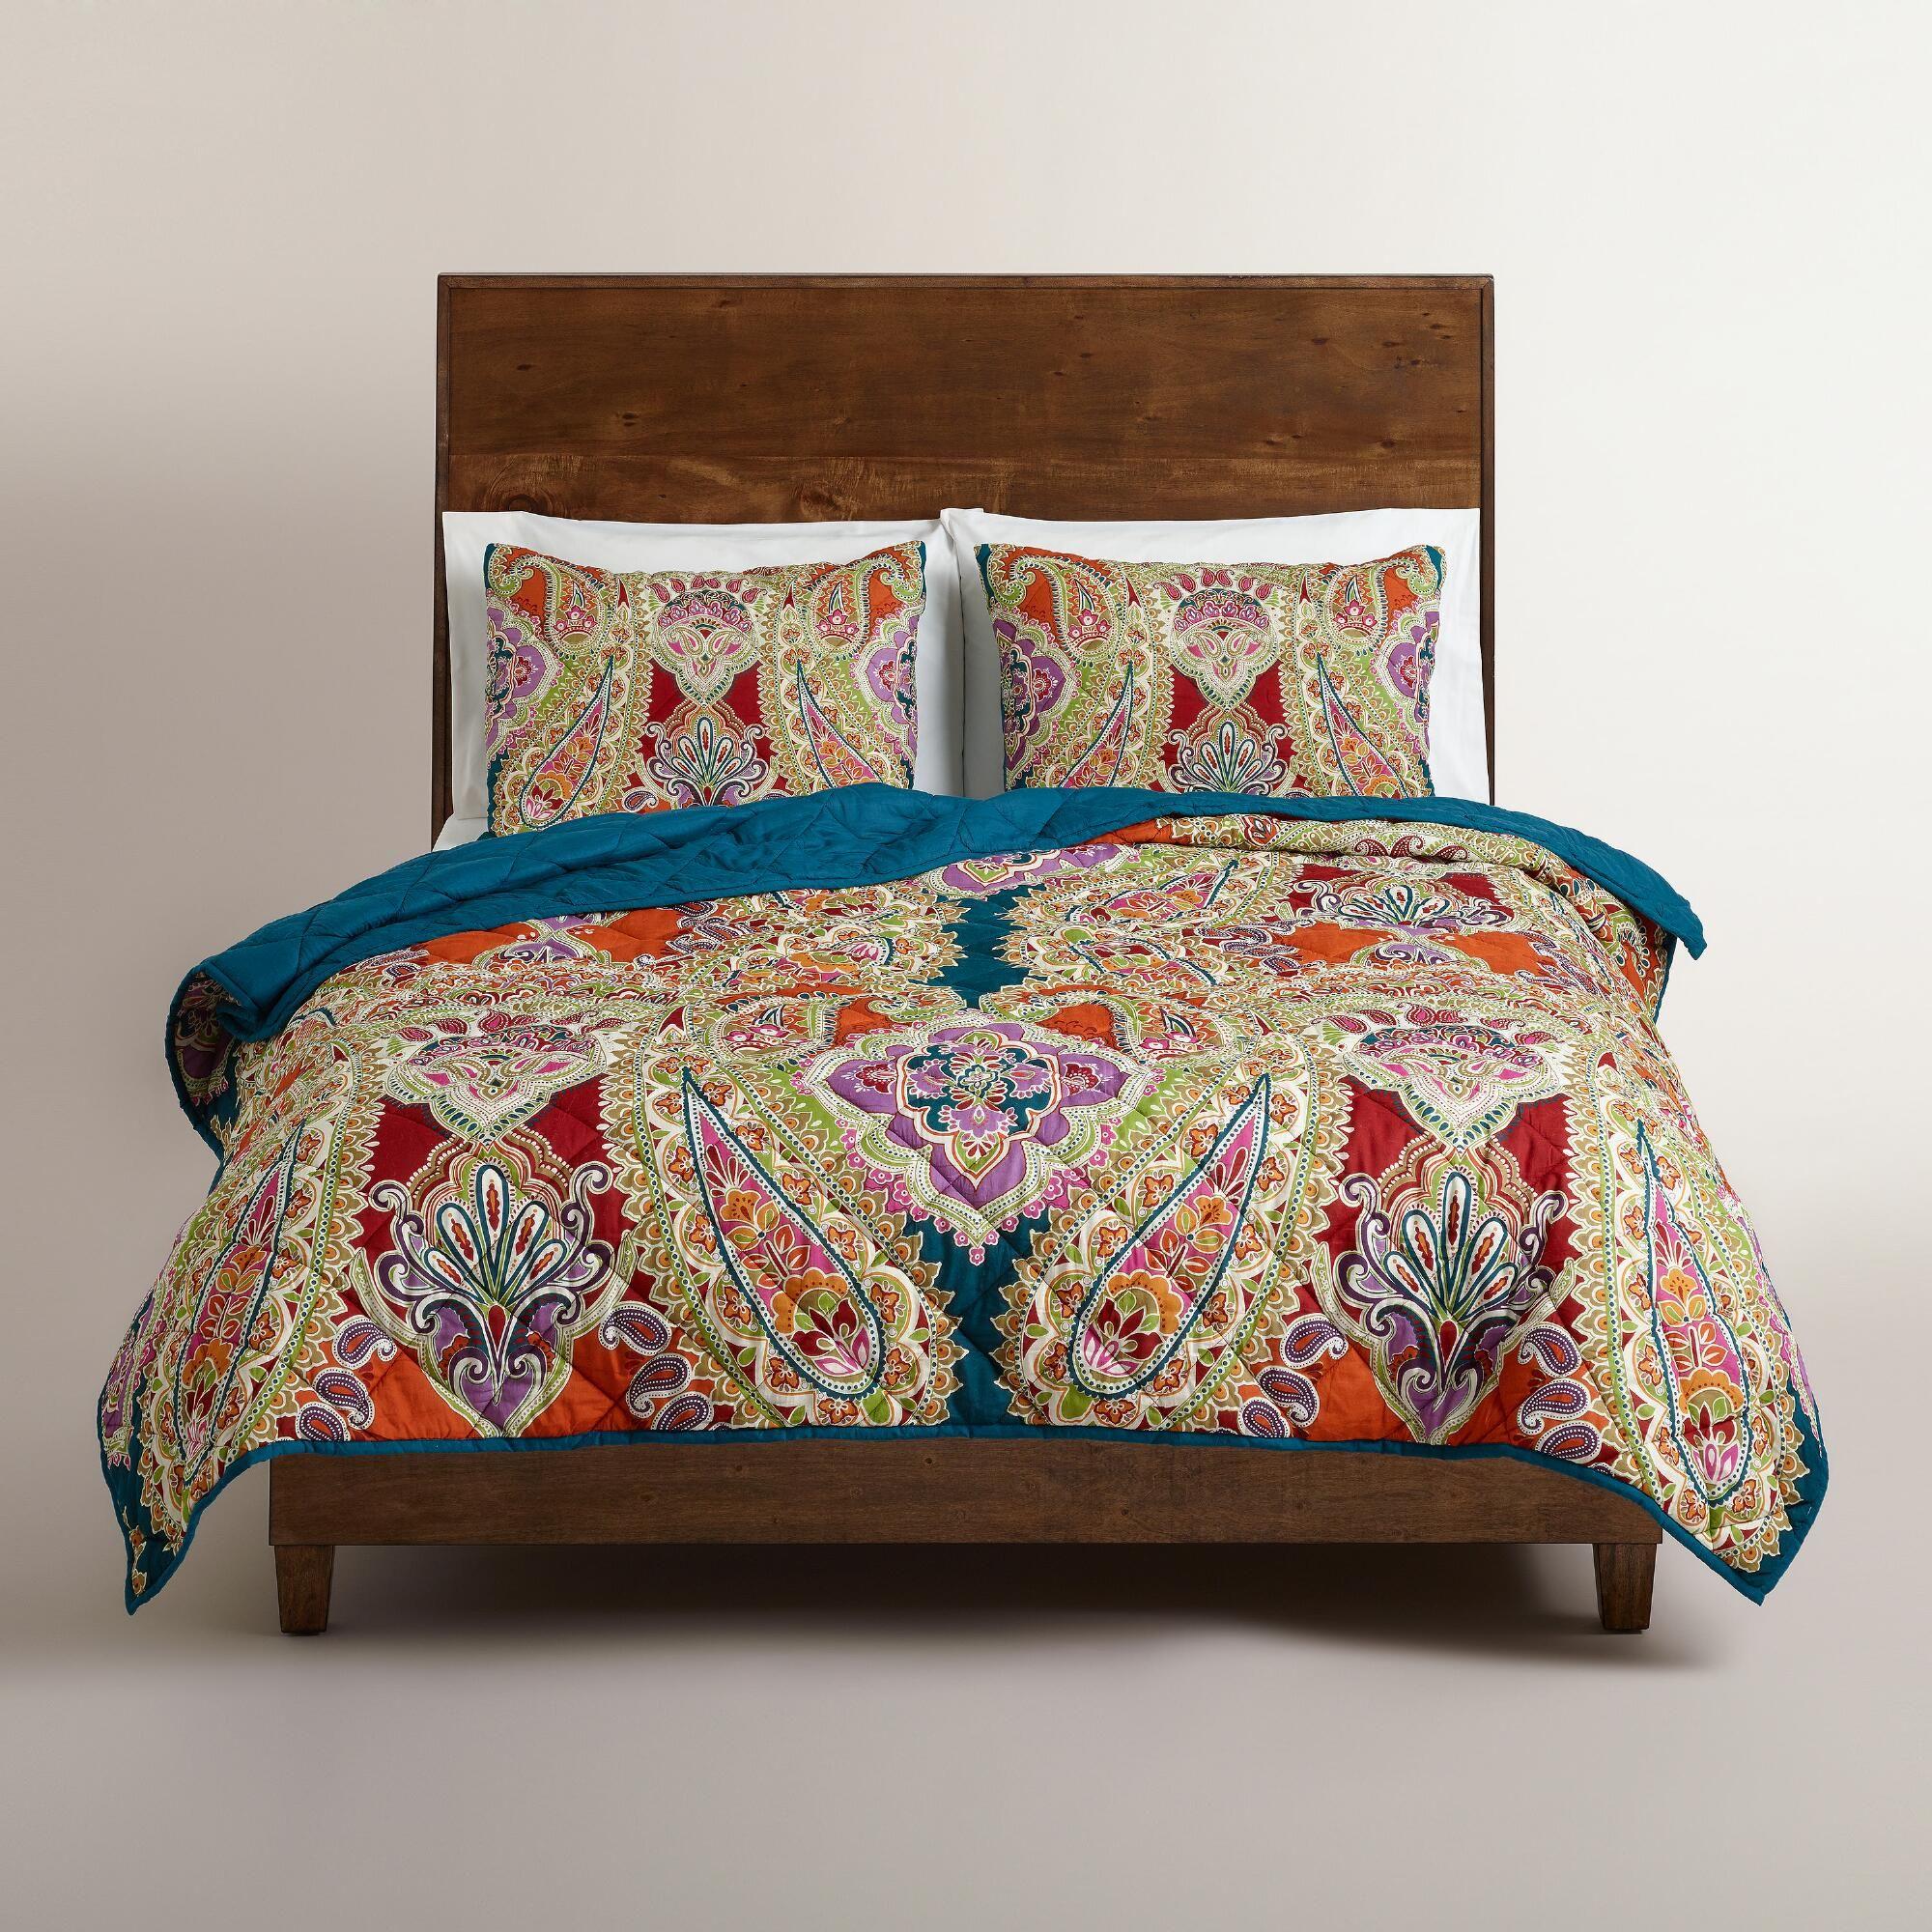 Venetian Bedding Collection Upholstered Beds Duvet Cover Sets